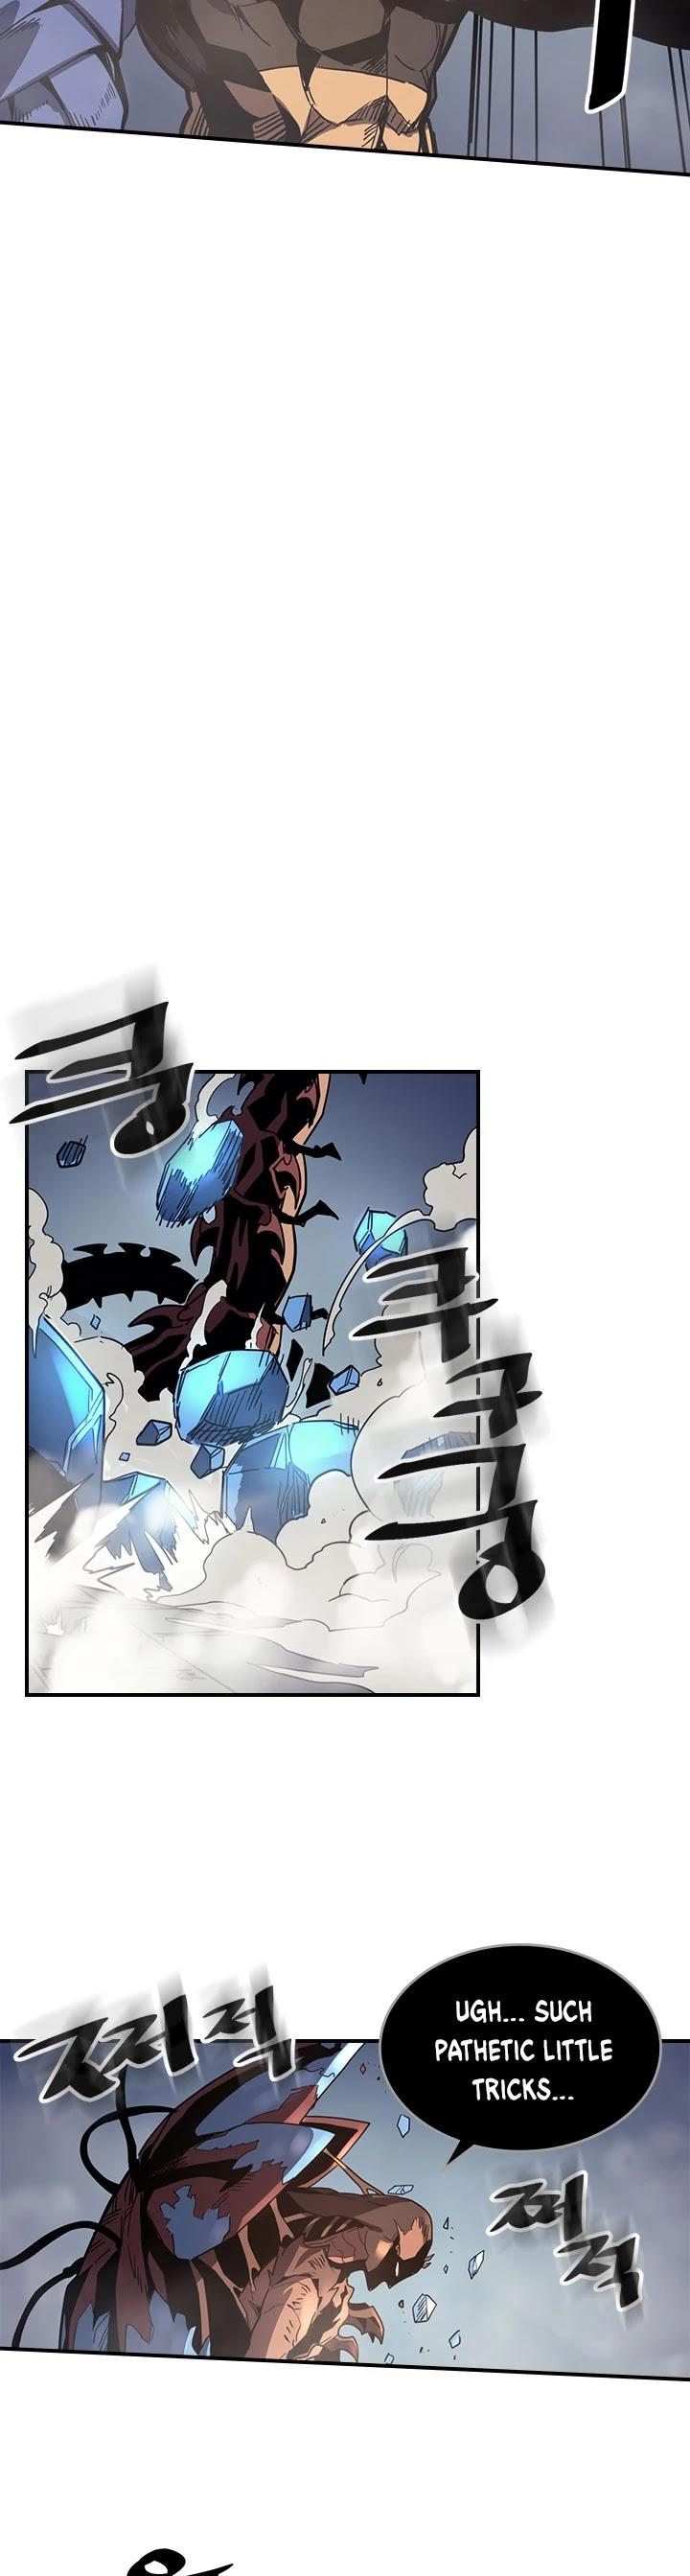 A Returner's Magic Should Be Special Chapter 112 page 22 - Mangakakalots.com